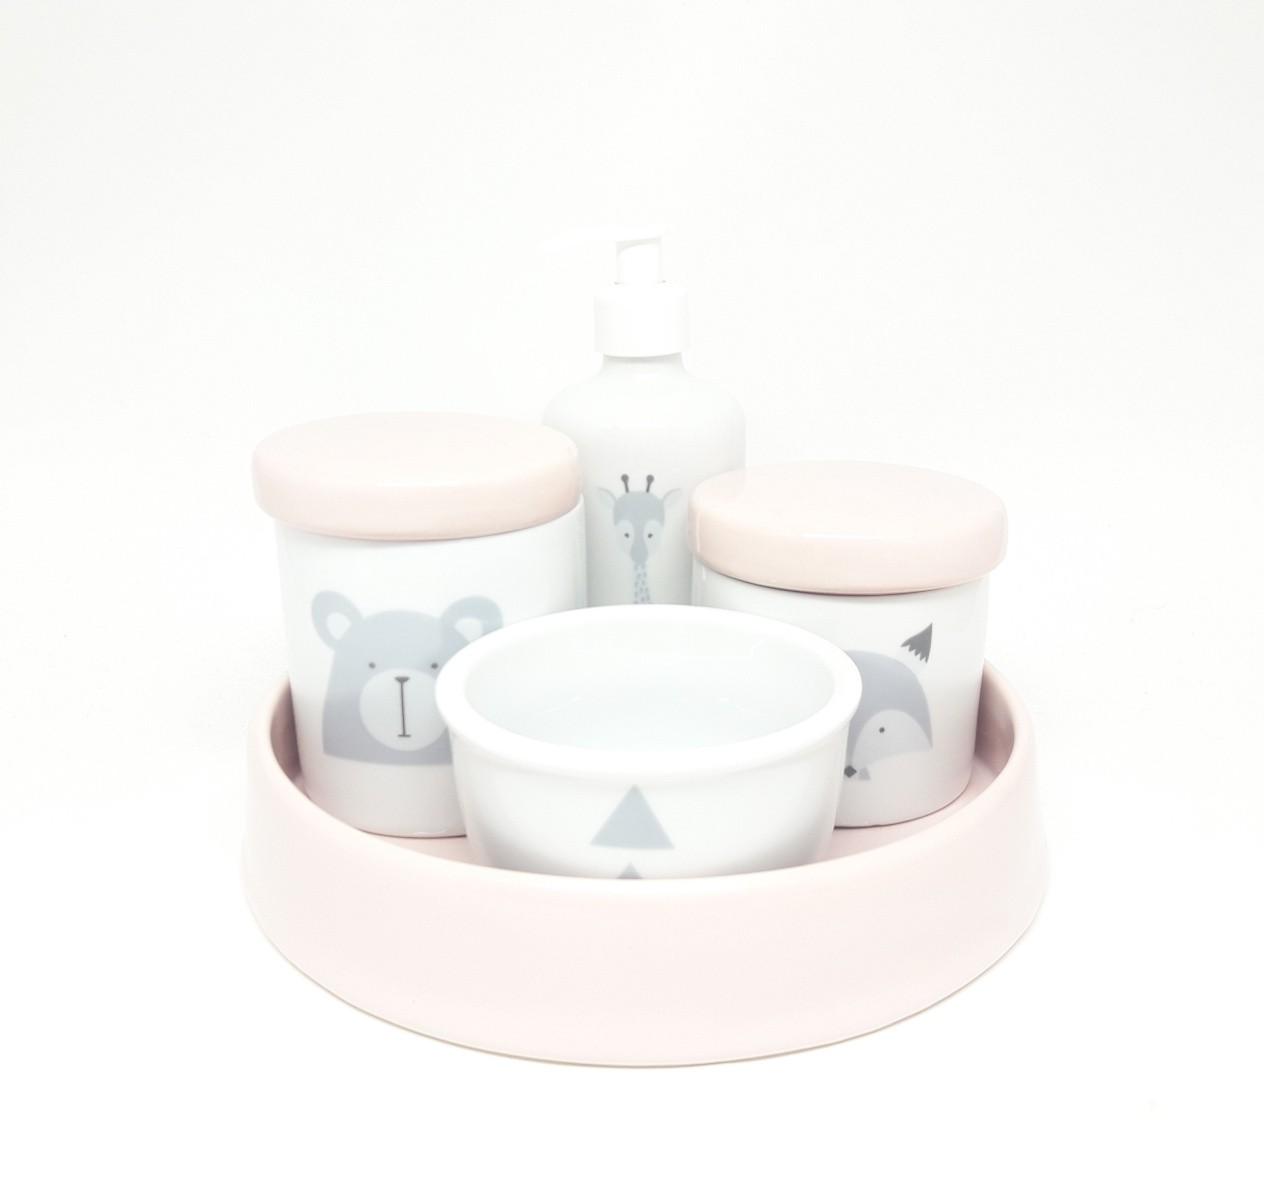 Kit Higiene Bebê Porcelana Escandinavo com Bandeja / Rosa Claro